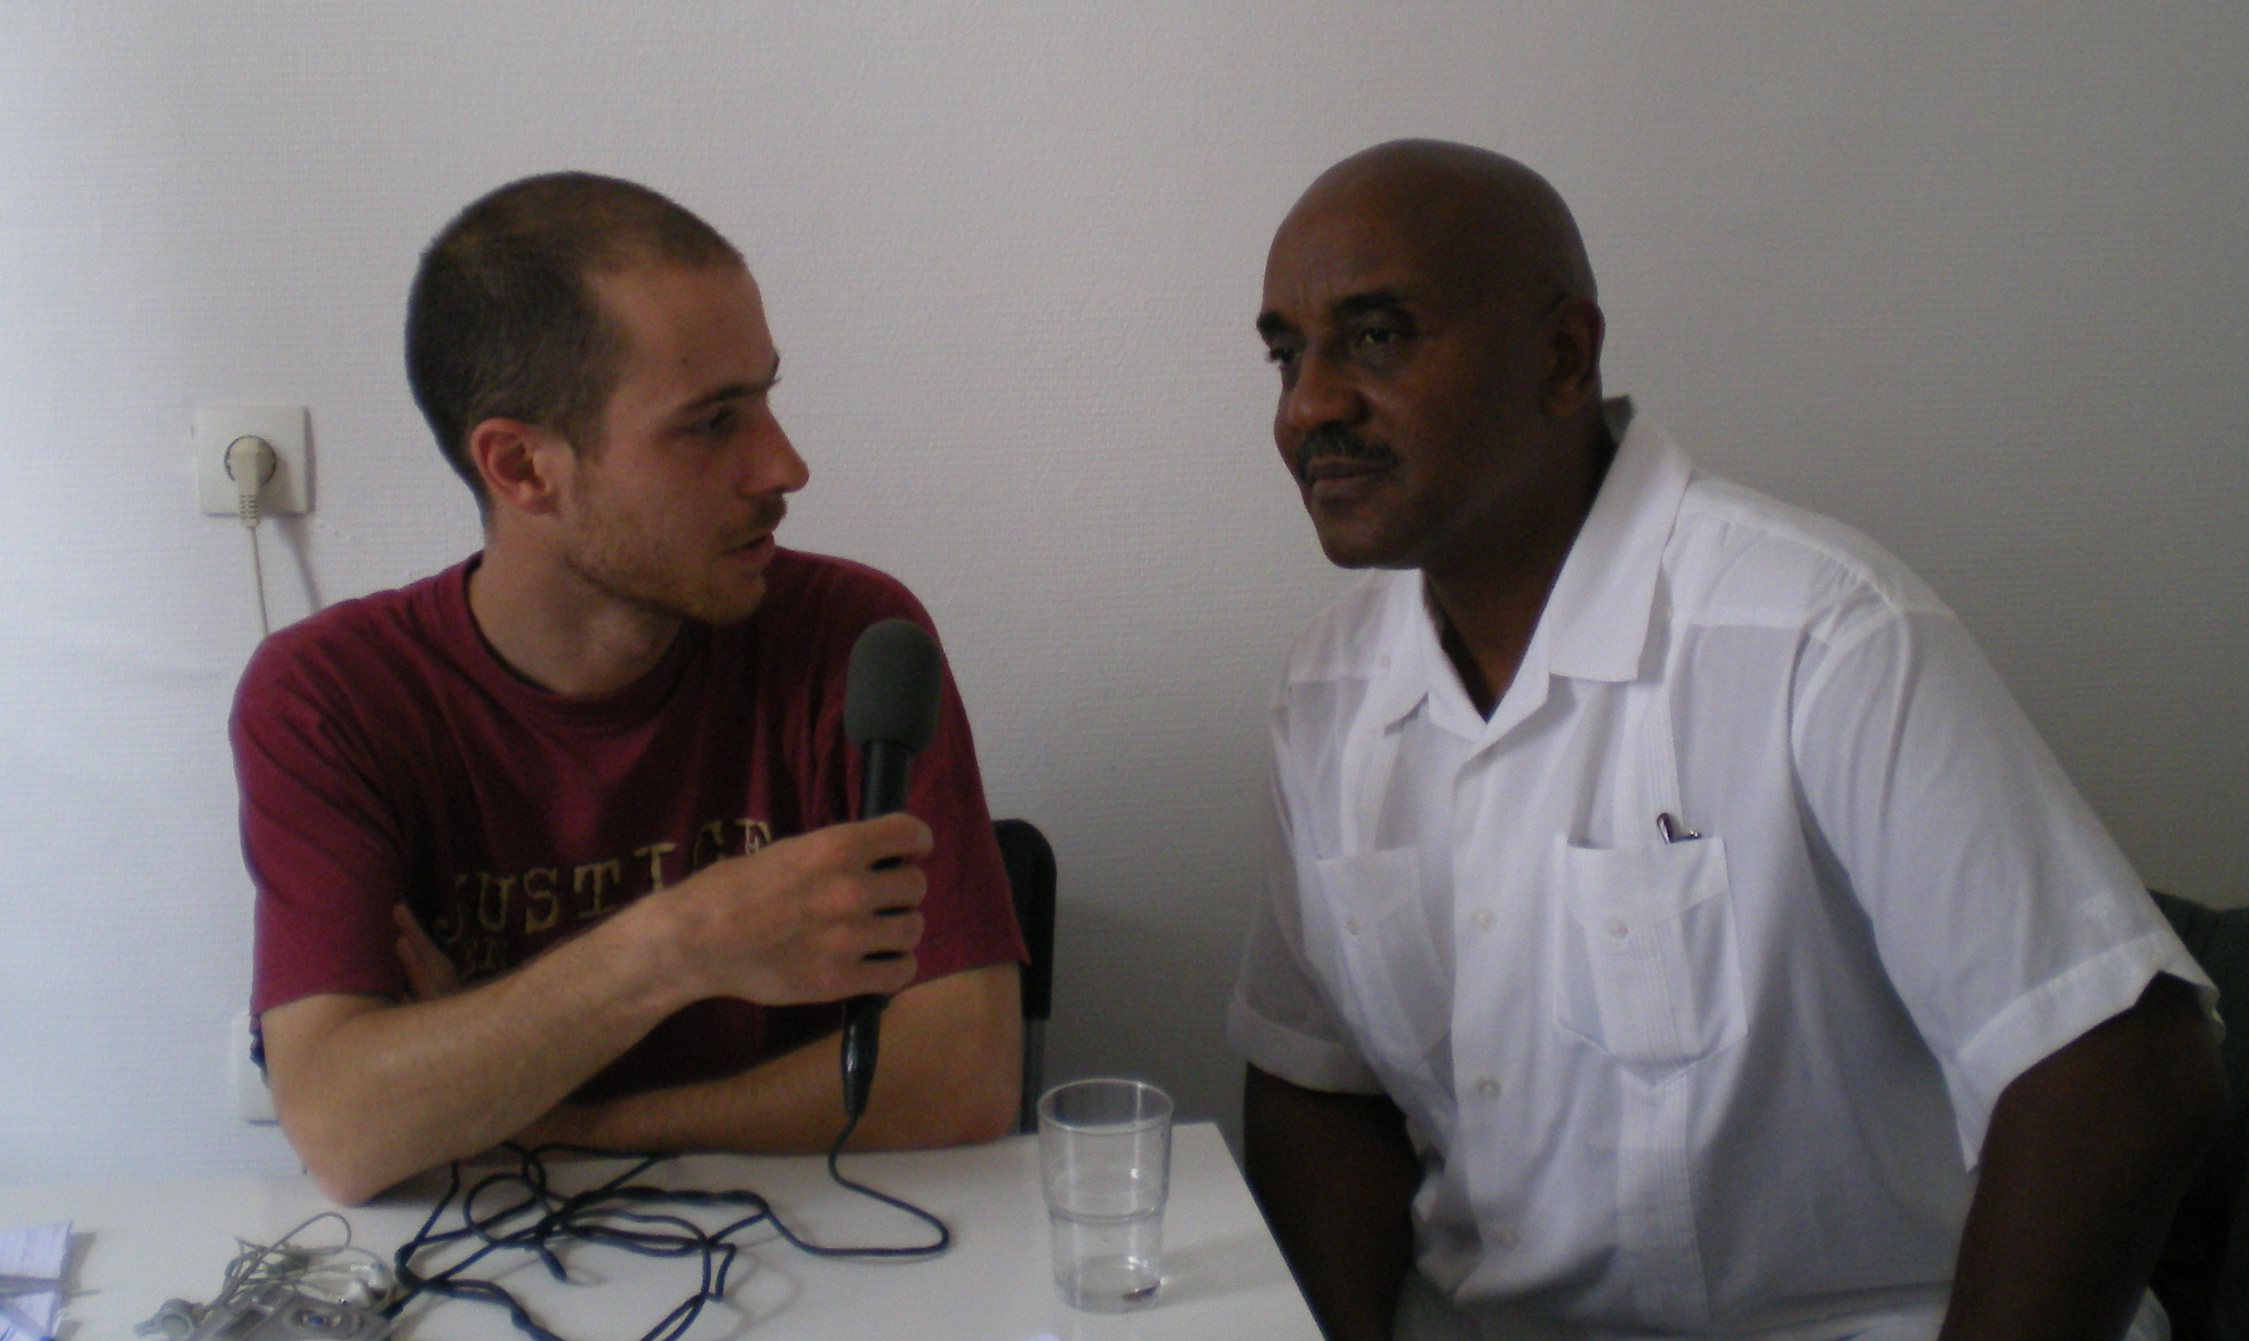 Thomas et Ahmad Rahman, Saint-Denis, juin 2007.